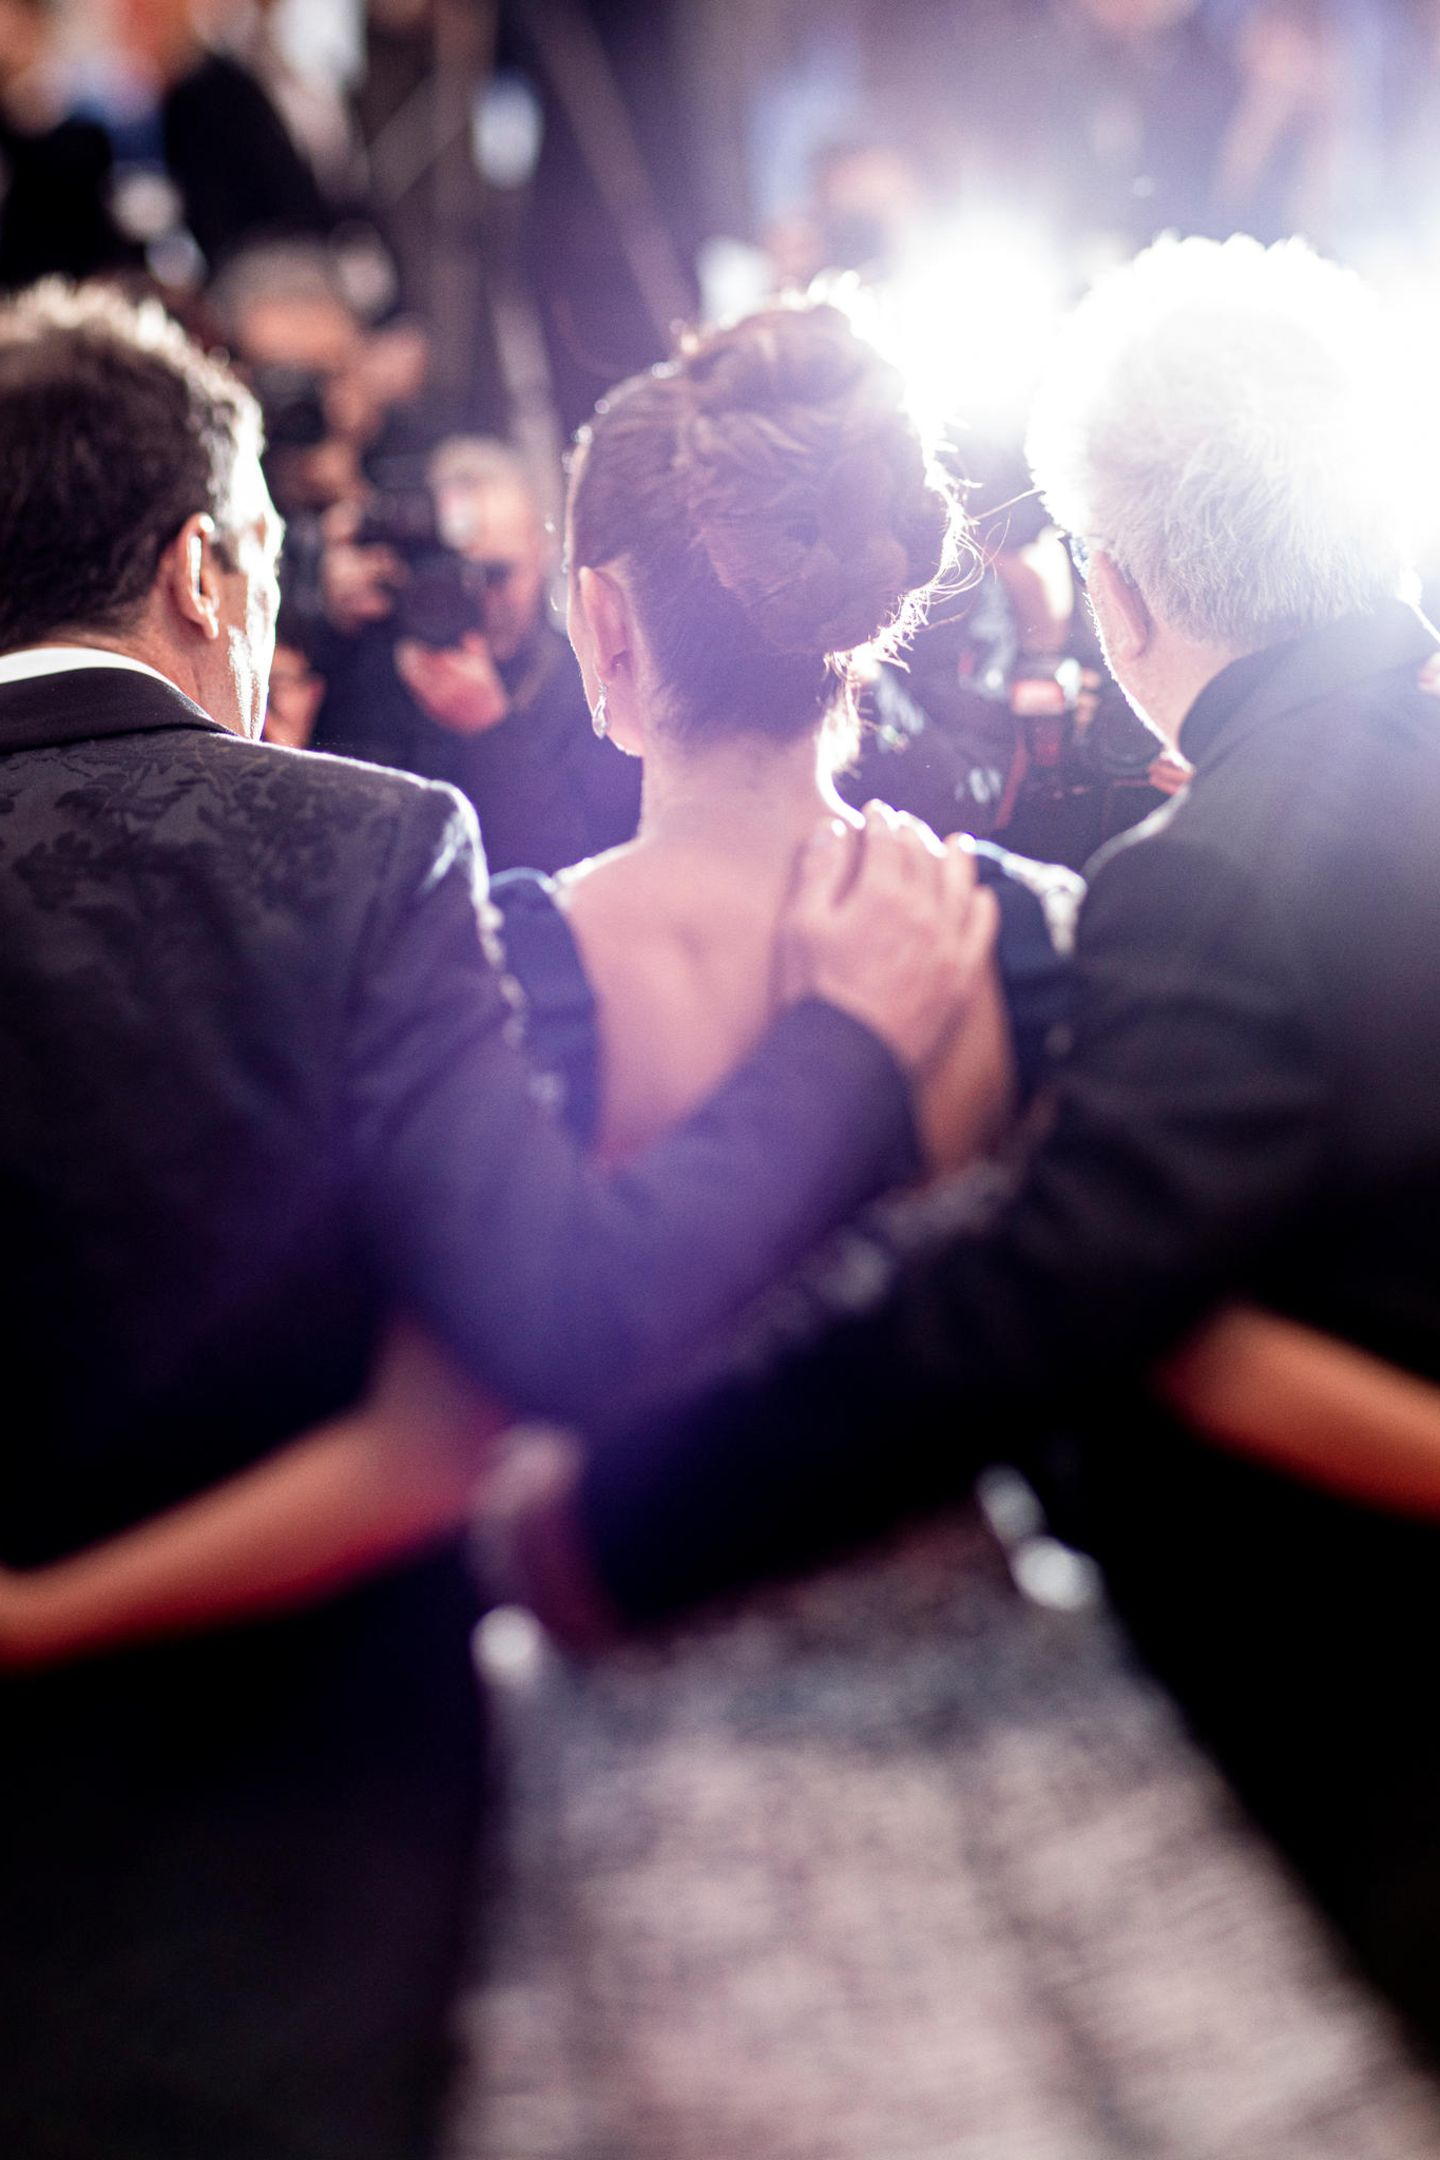 Antonio Banderas,Penélope Cruz undPedro Almodóvar präsentieren sich den wartenden Fotografen.